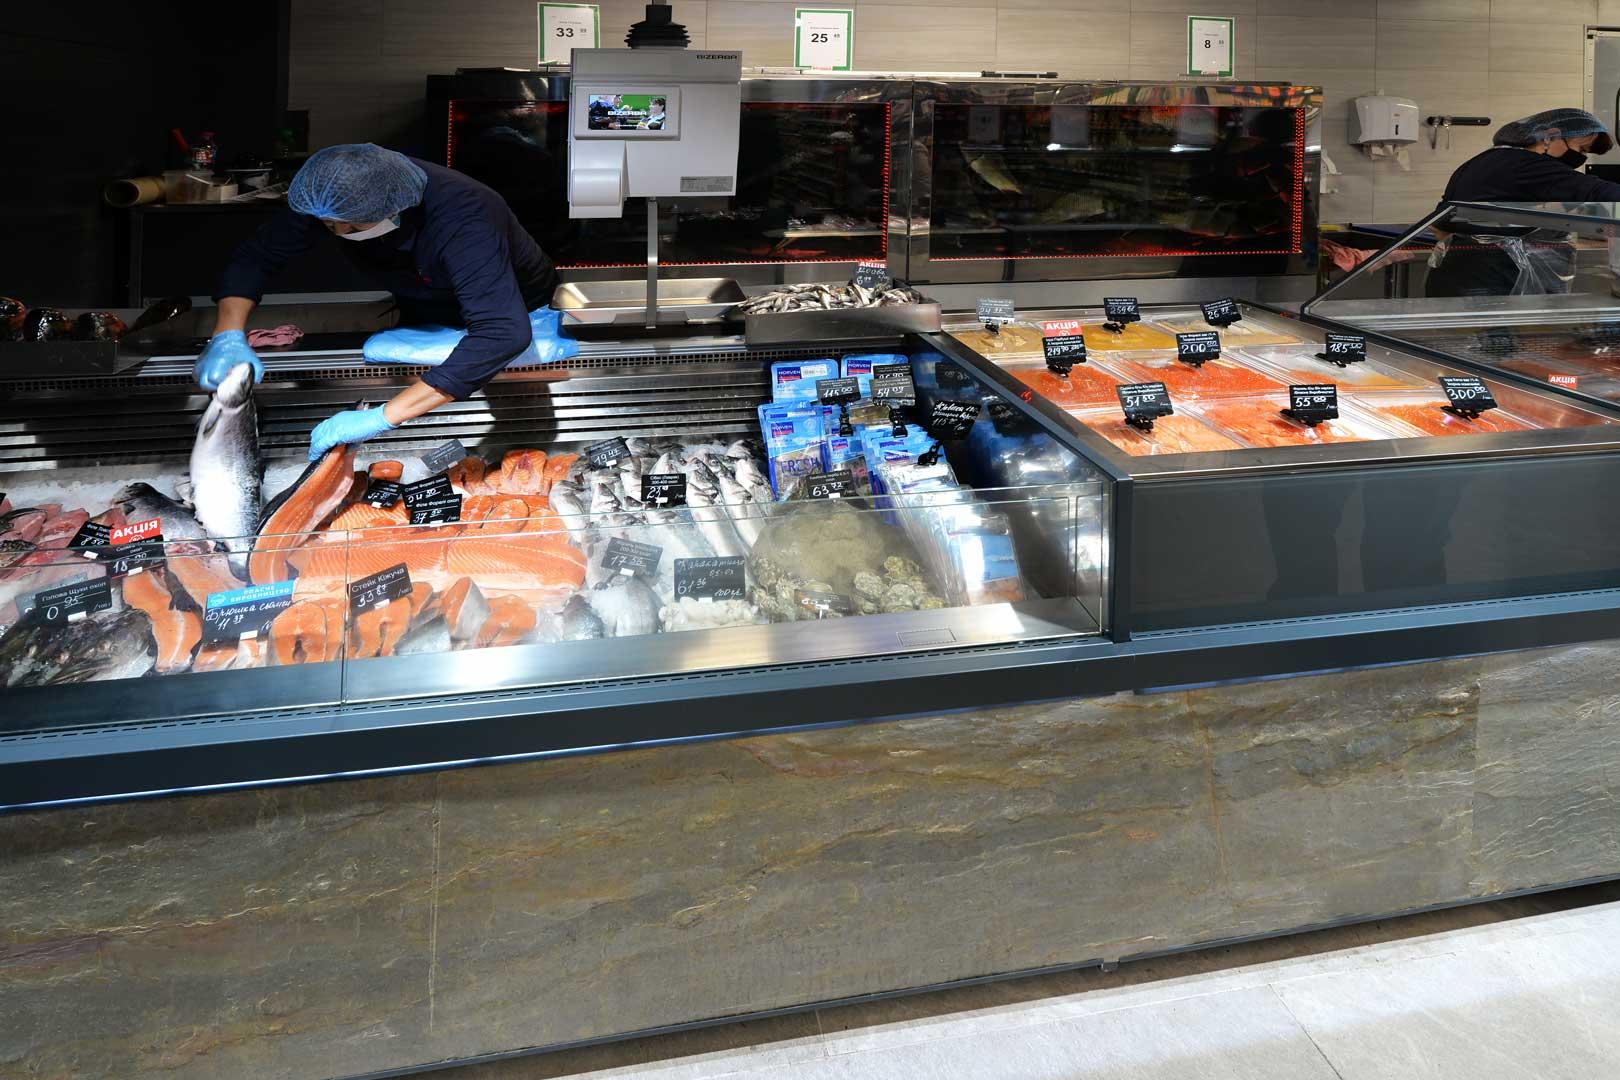 Refrigerated counters Missouri AC 120 ice self